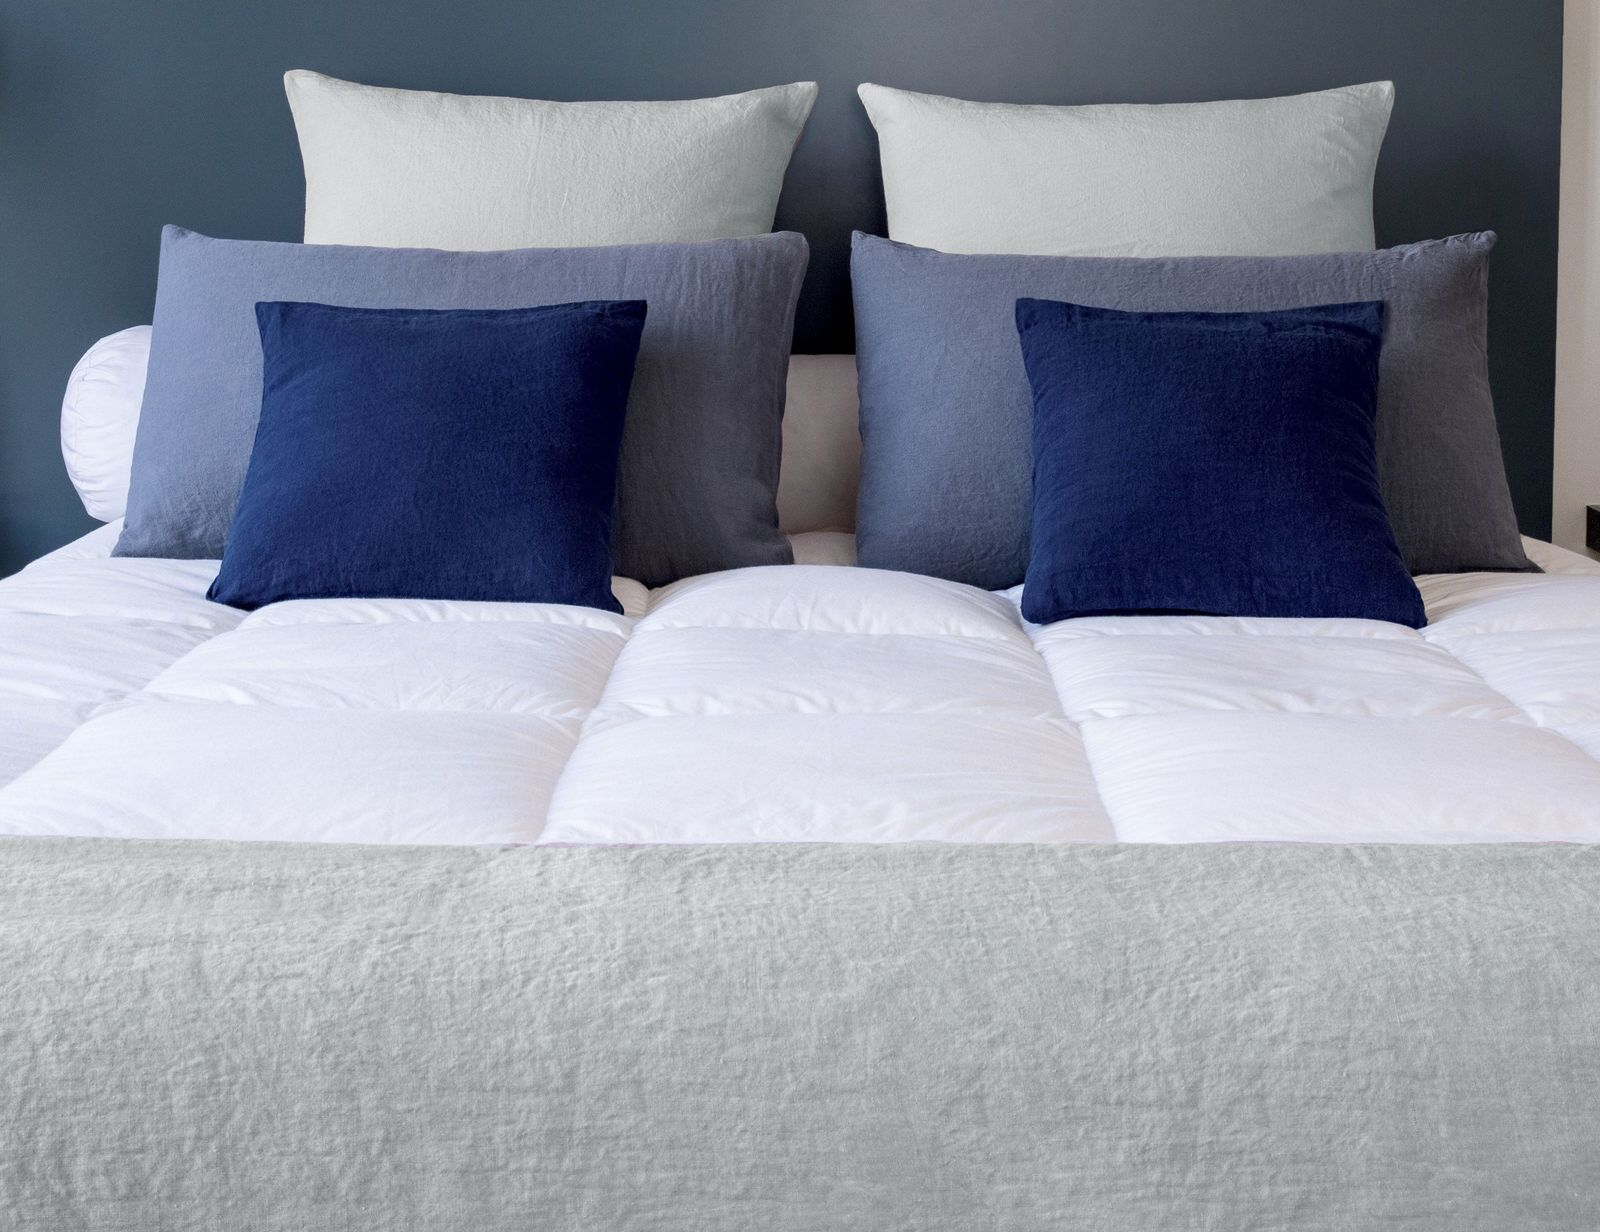 exklusiver daunentopper qualit t aus frankreich pyrenex royal. Black Bedroom Furniture Sets. Home Design Ideas